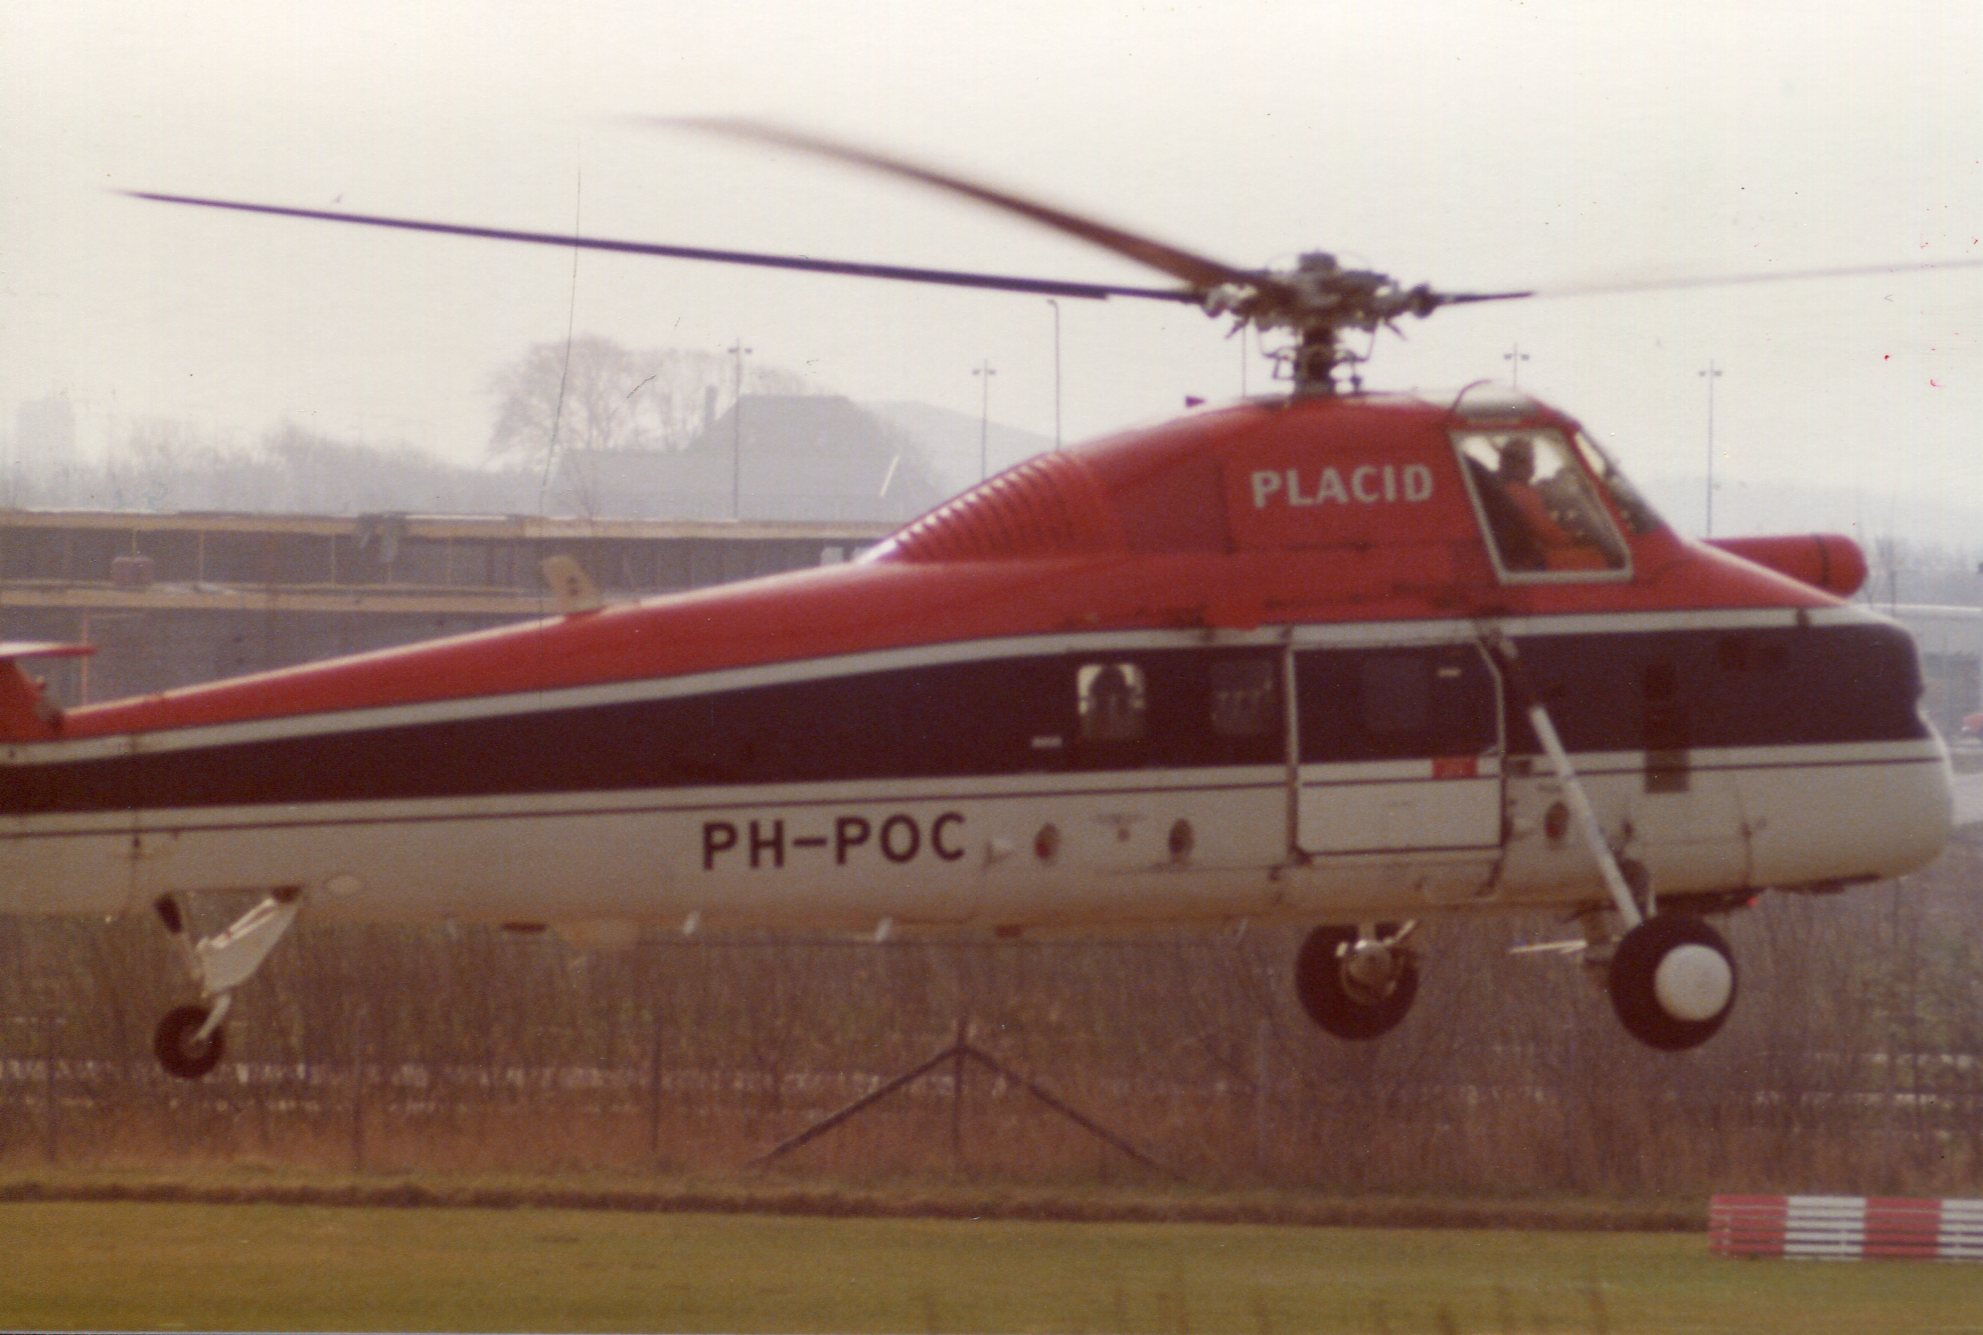 Naam: Den Helder , april 1977.jpg Bekeken: 461 Grootte: 279,4 KB